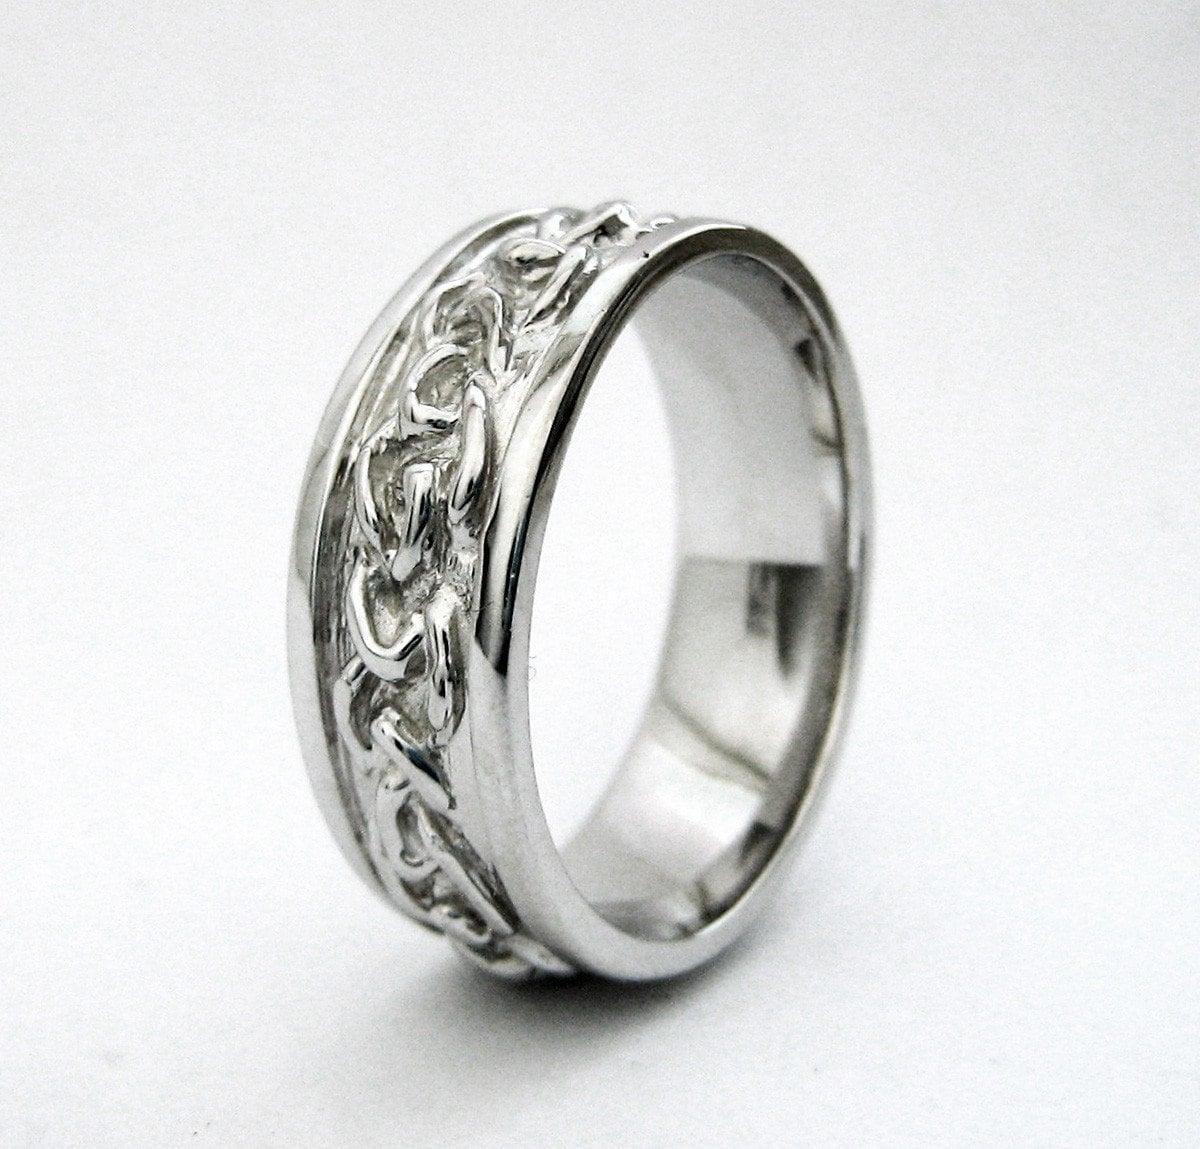 Men S Celtic Wedding Band Handmade Love Knot Braid Ring